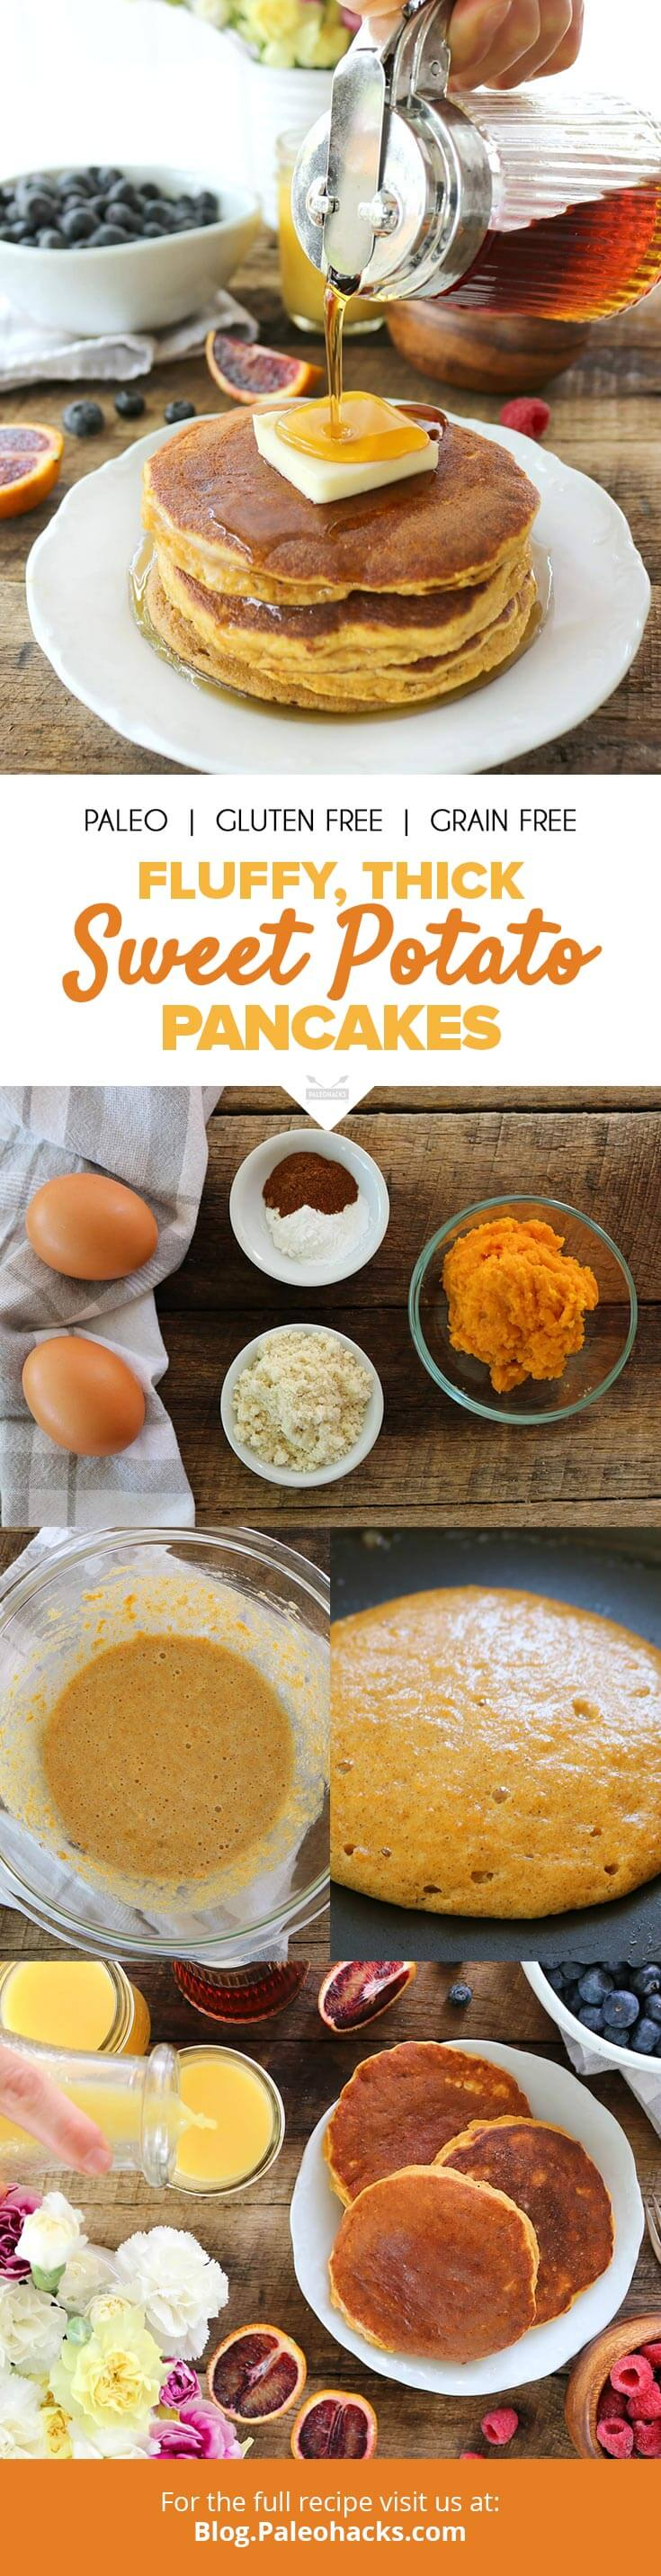 PIN-Fluffy-Thick-Sweet-Potato-Pancakes.jpg